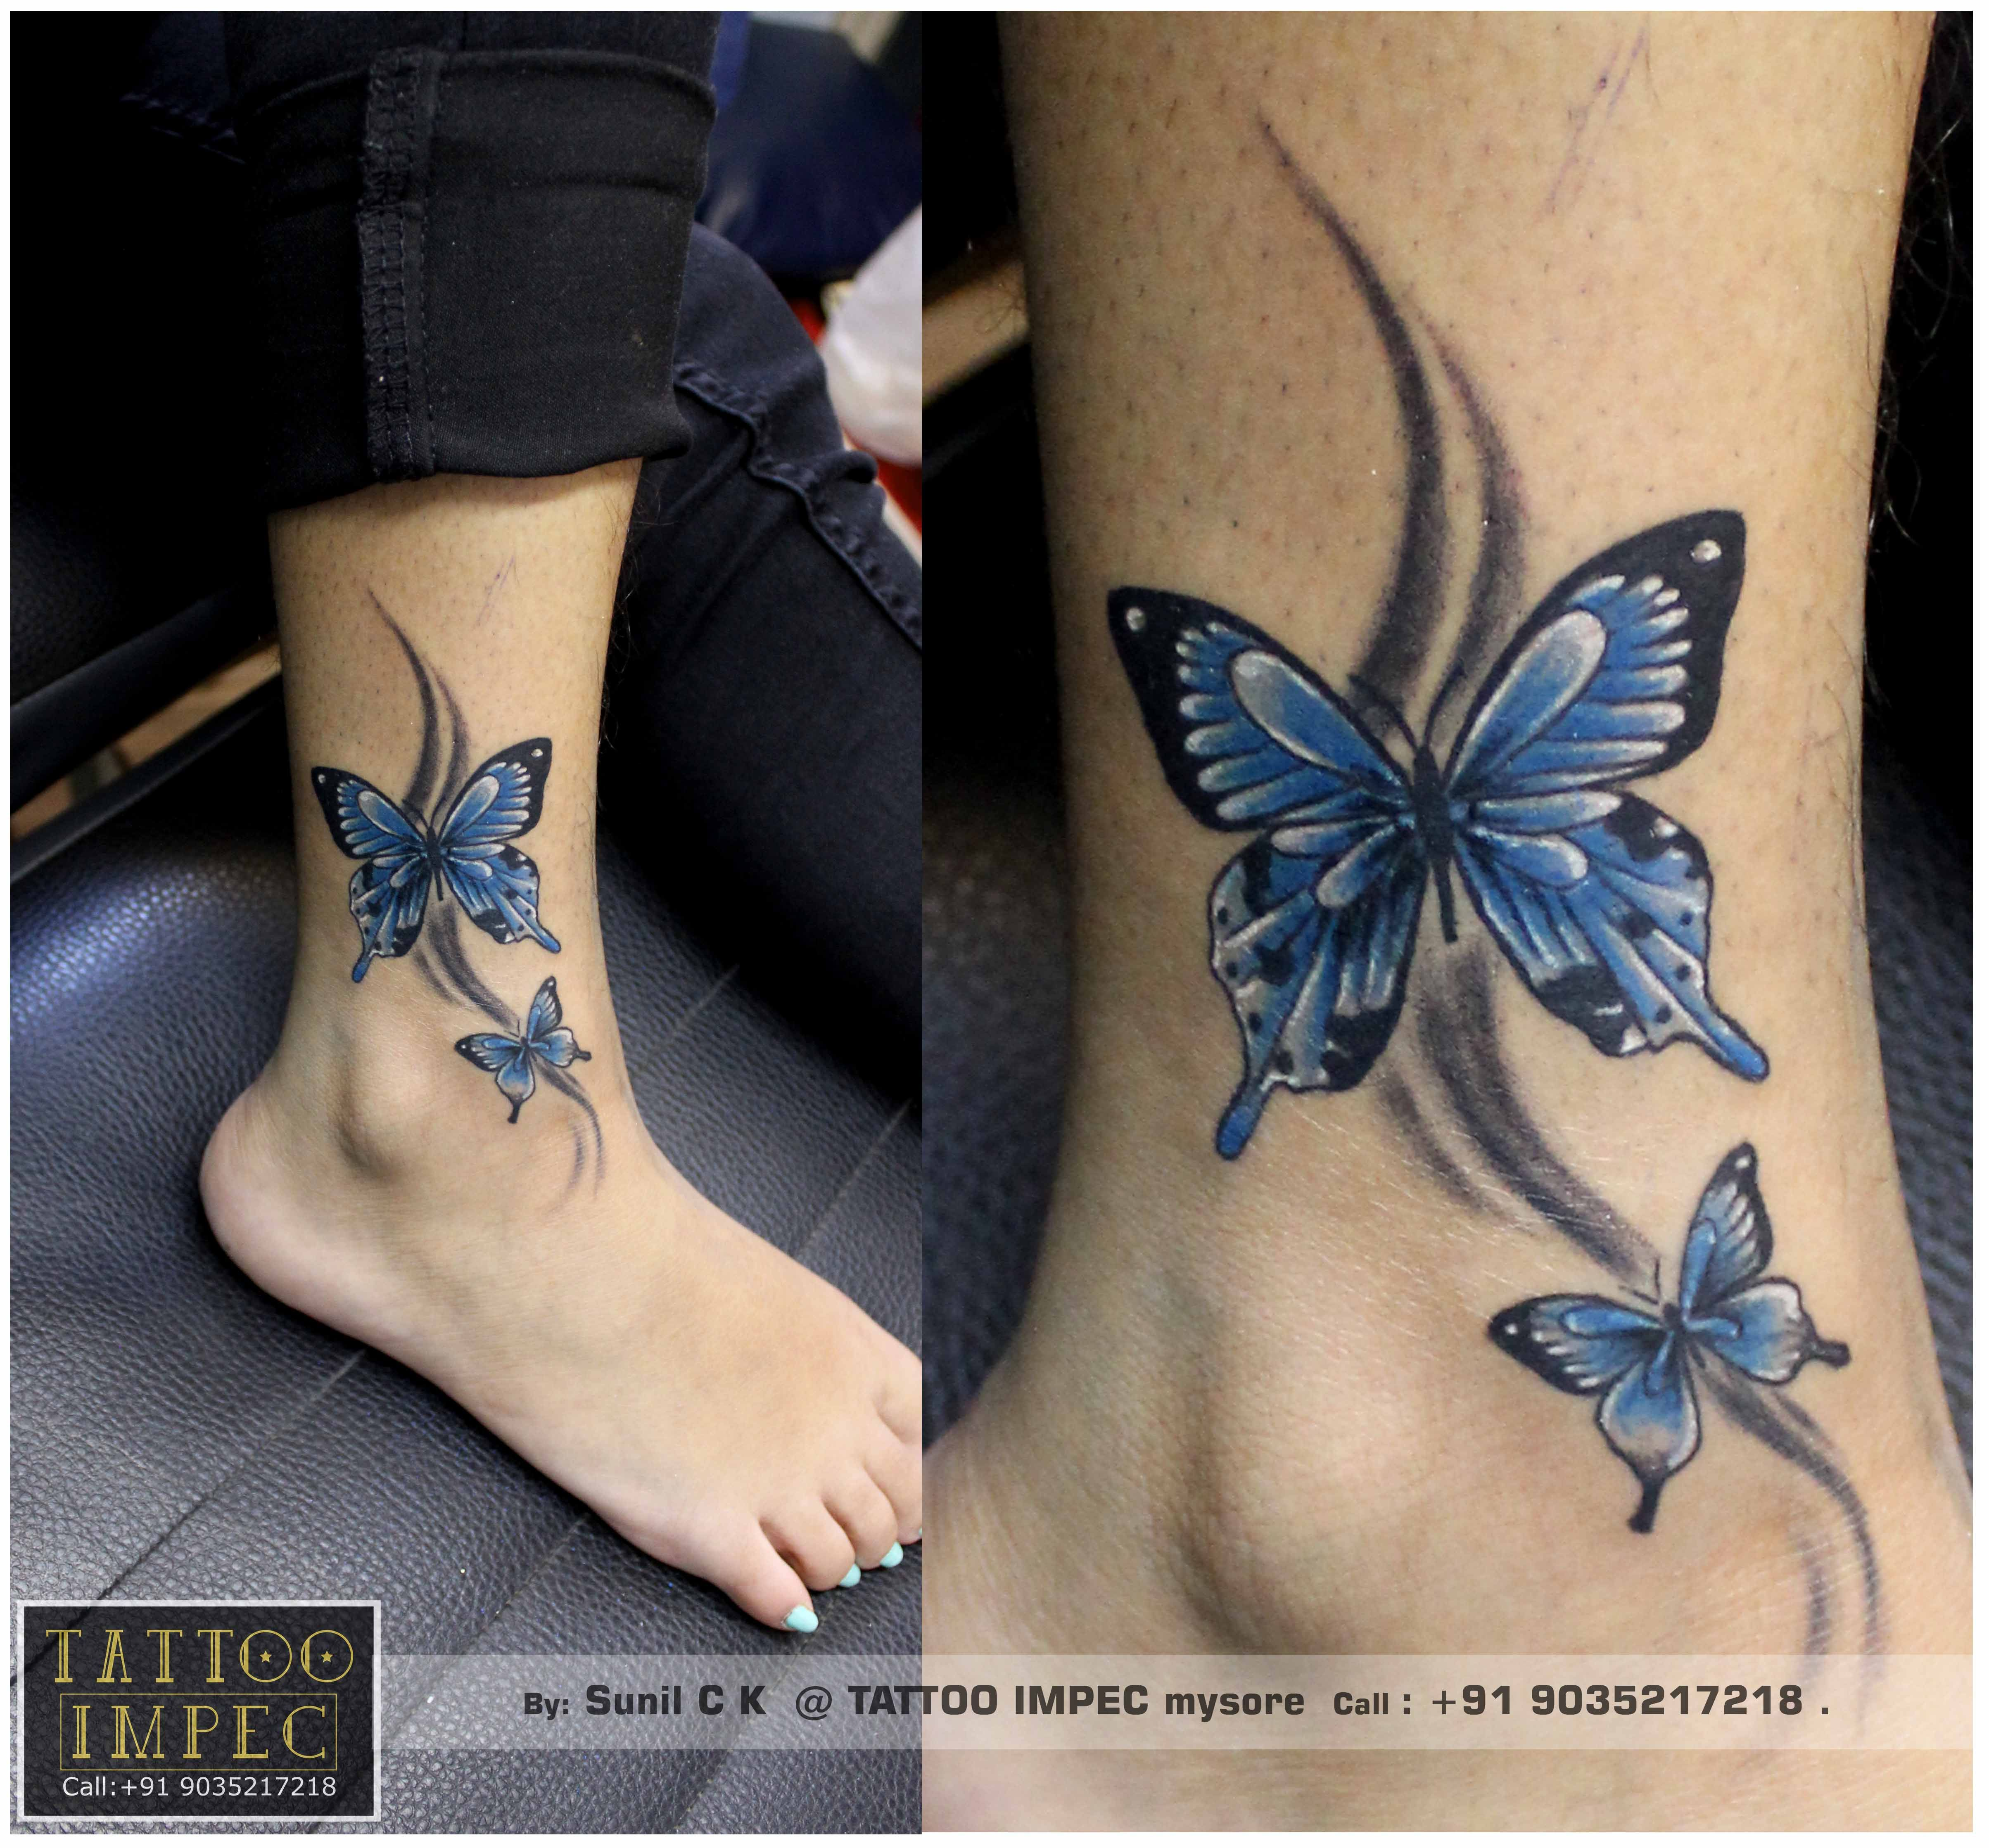 Butterfly Tattoo Tattoo Tattoo Designs For Girls Blue Butterfly Tattoo Get Inked From Experienced Tattoo Pr Tattoos Butterfly Tattoo Butterfly Ankle Tattoos